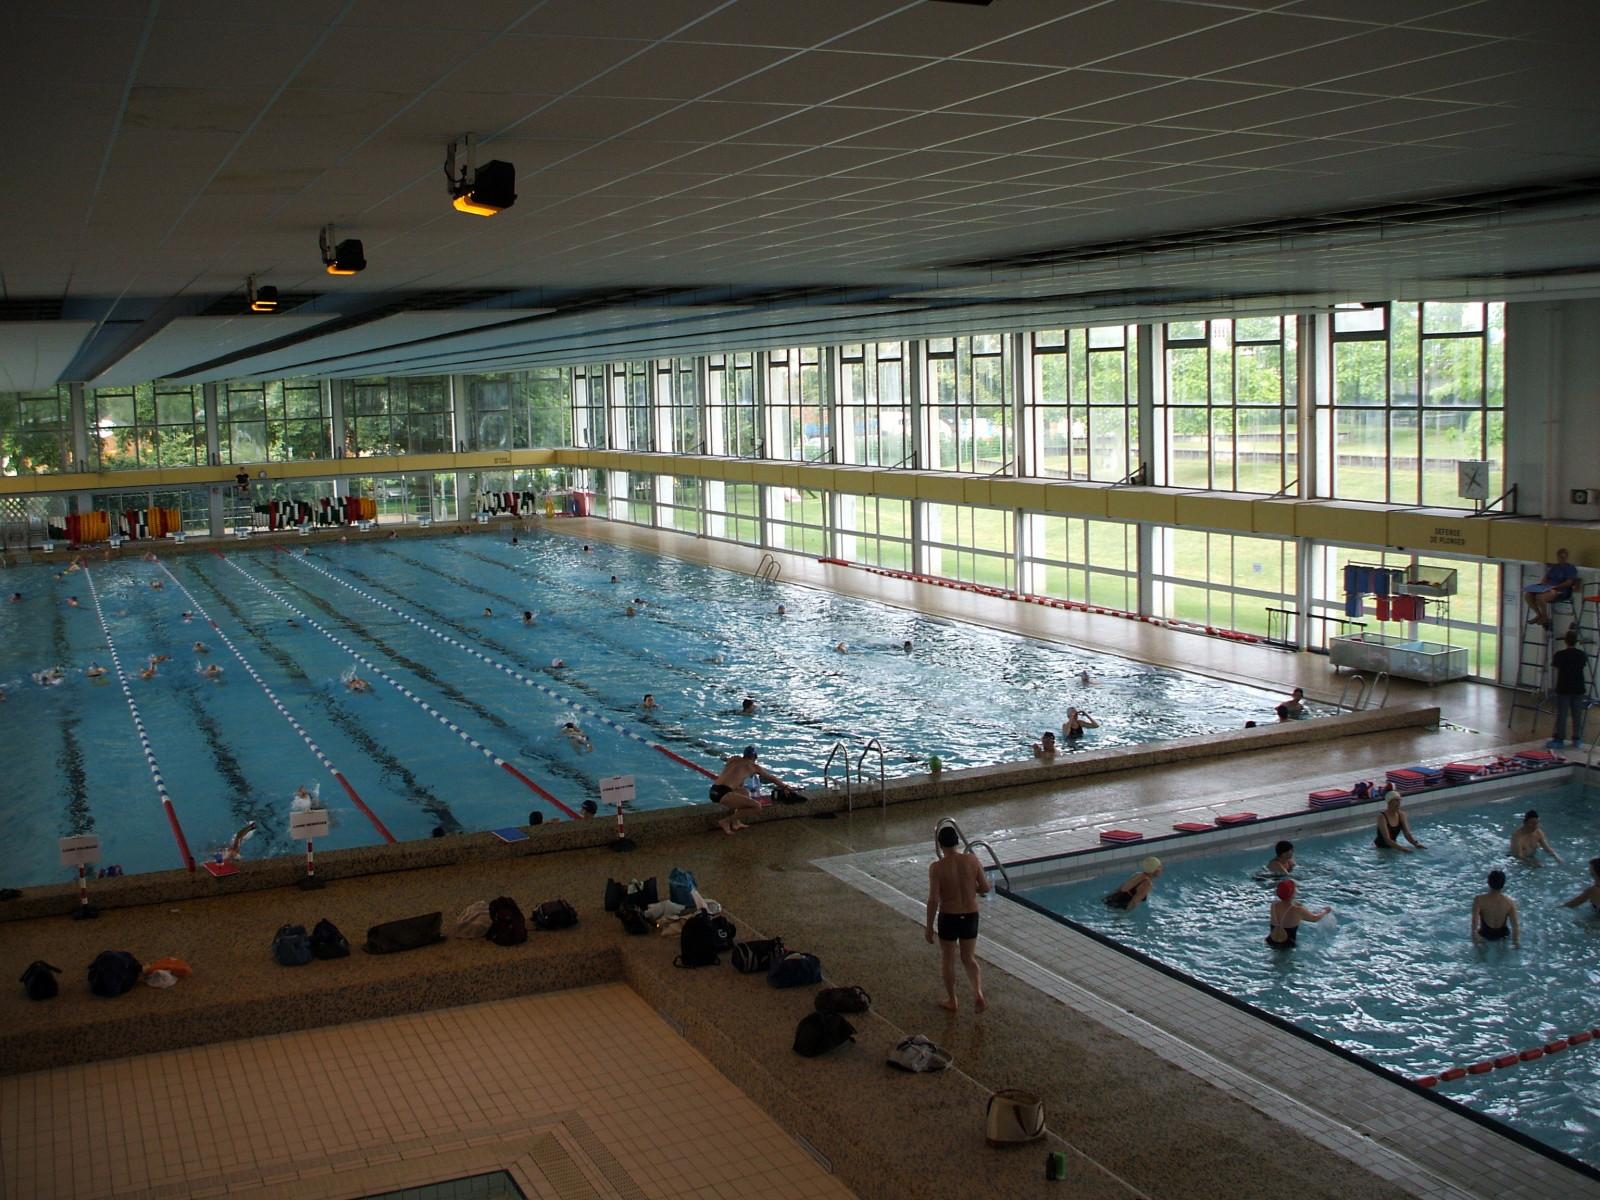 Meilleur de piscine pour bebe au luxembourg piscine for Piscine olympique nice